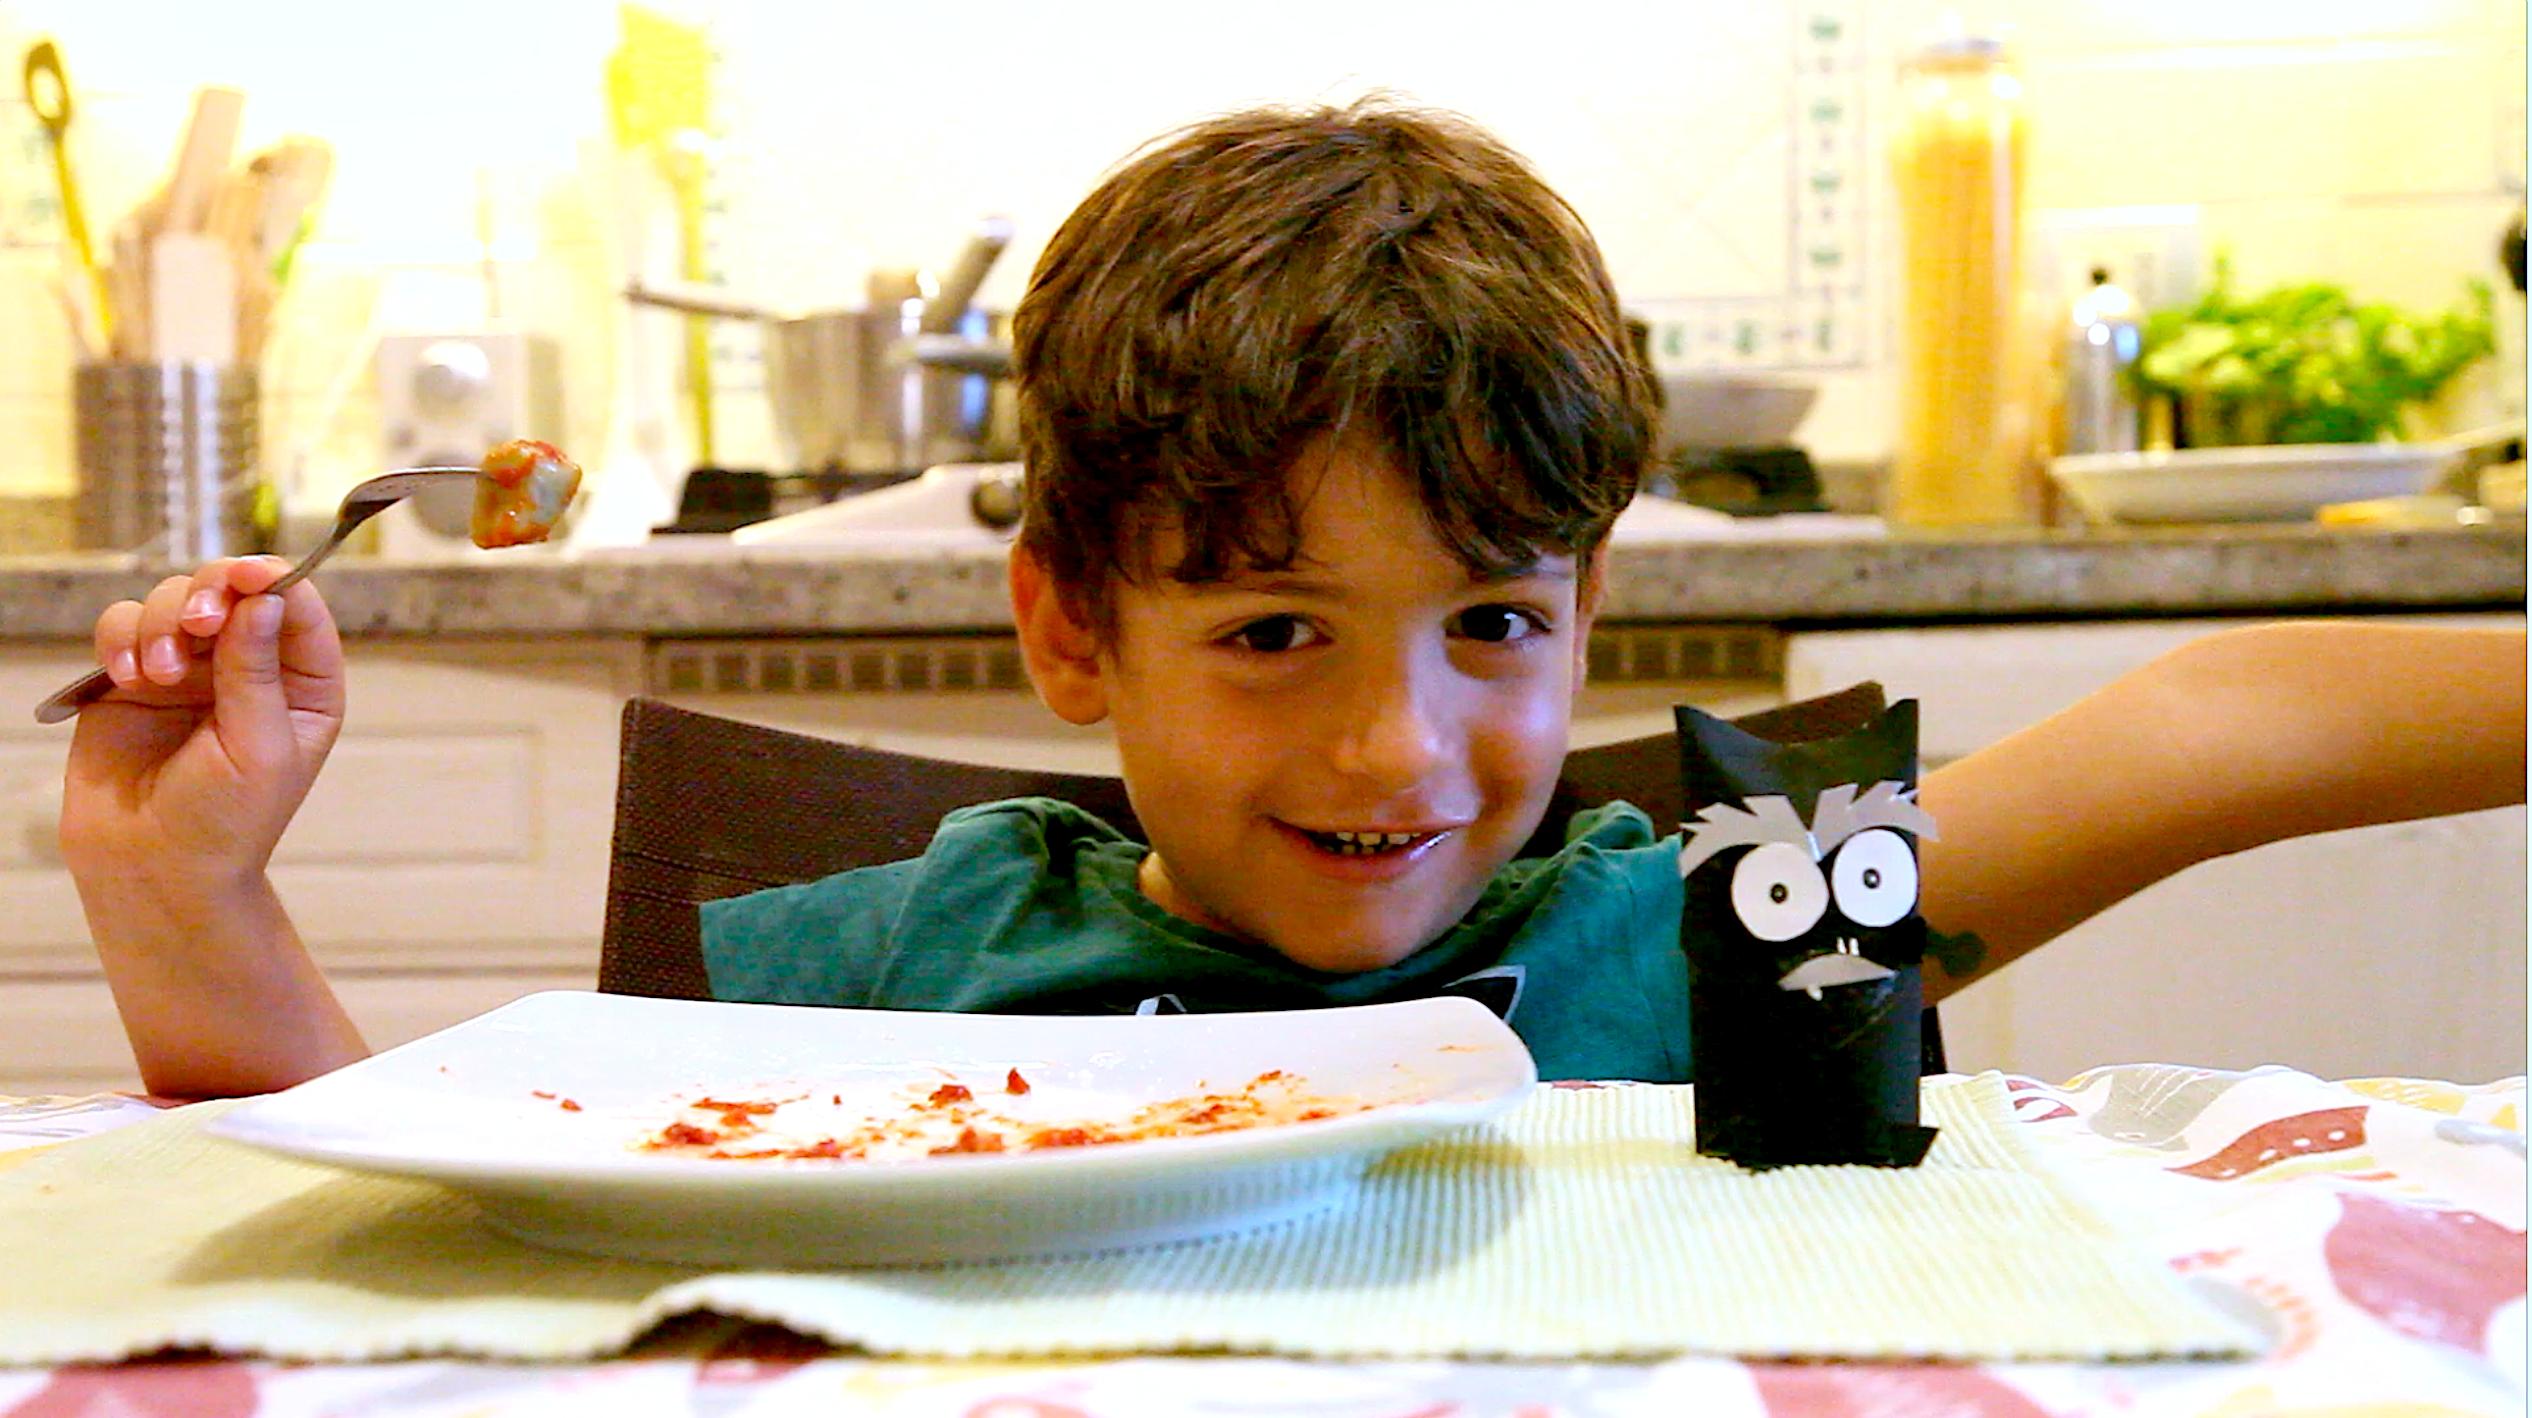 Matteo assaggia gnocchi